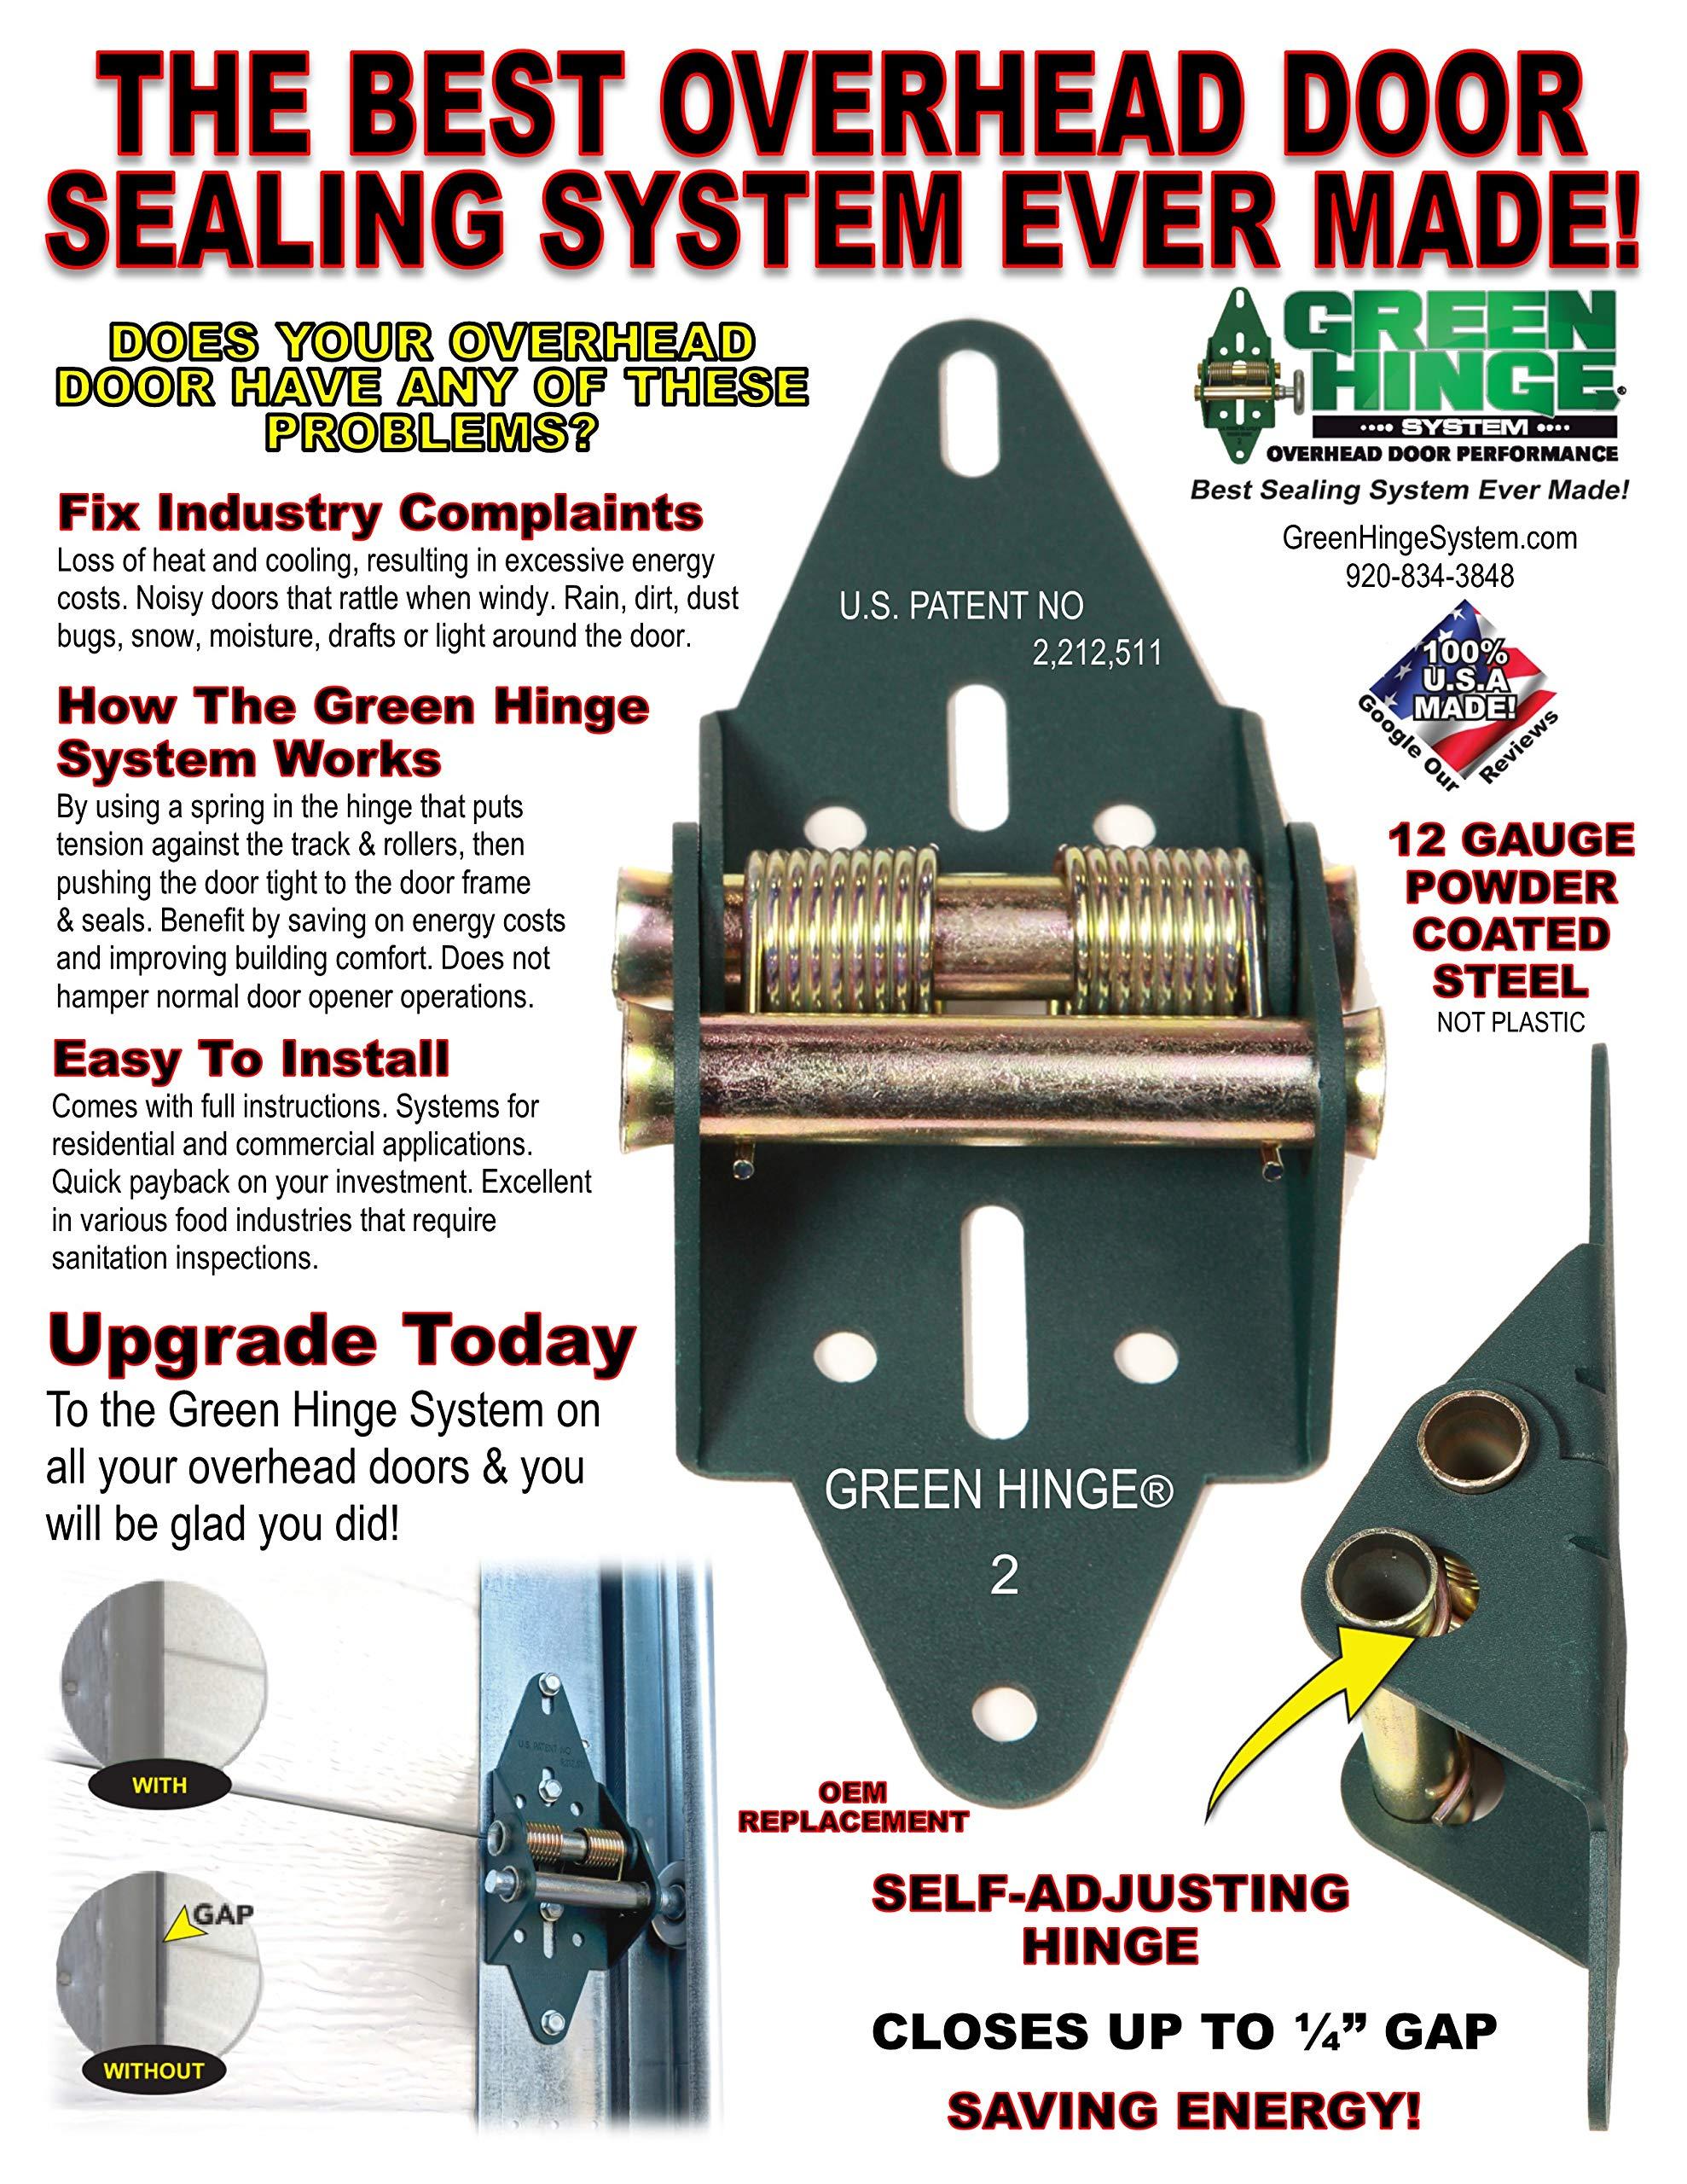 Energy Saving Garage Door Hinge, Residential Set, 4 Panel Door by Green Hinge (Image #1)